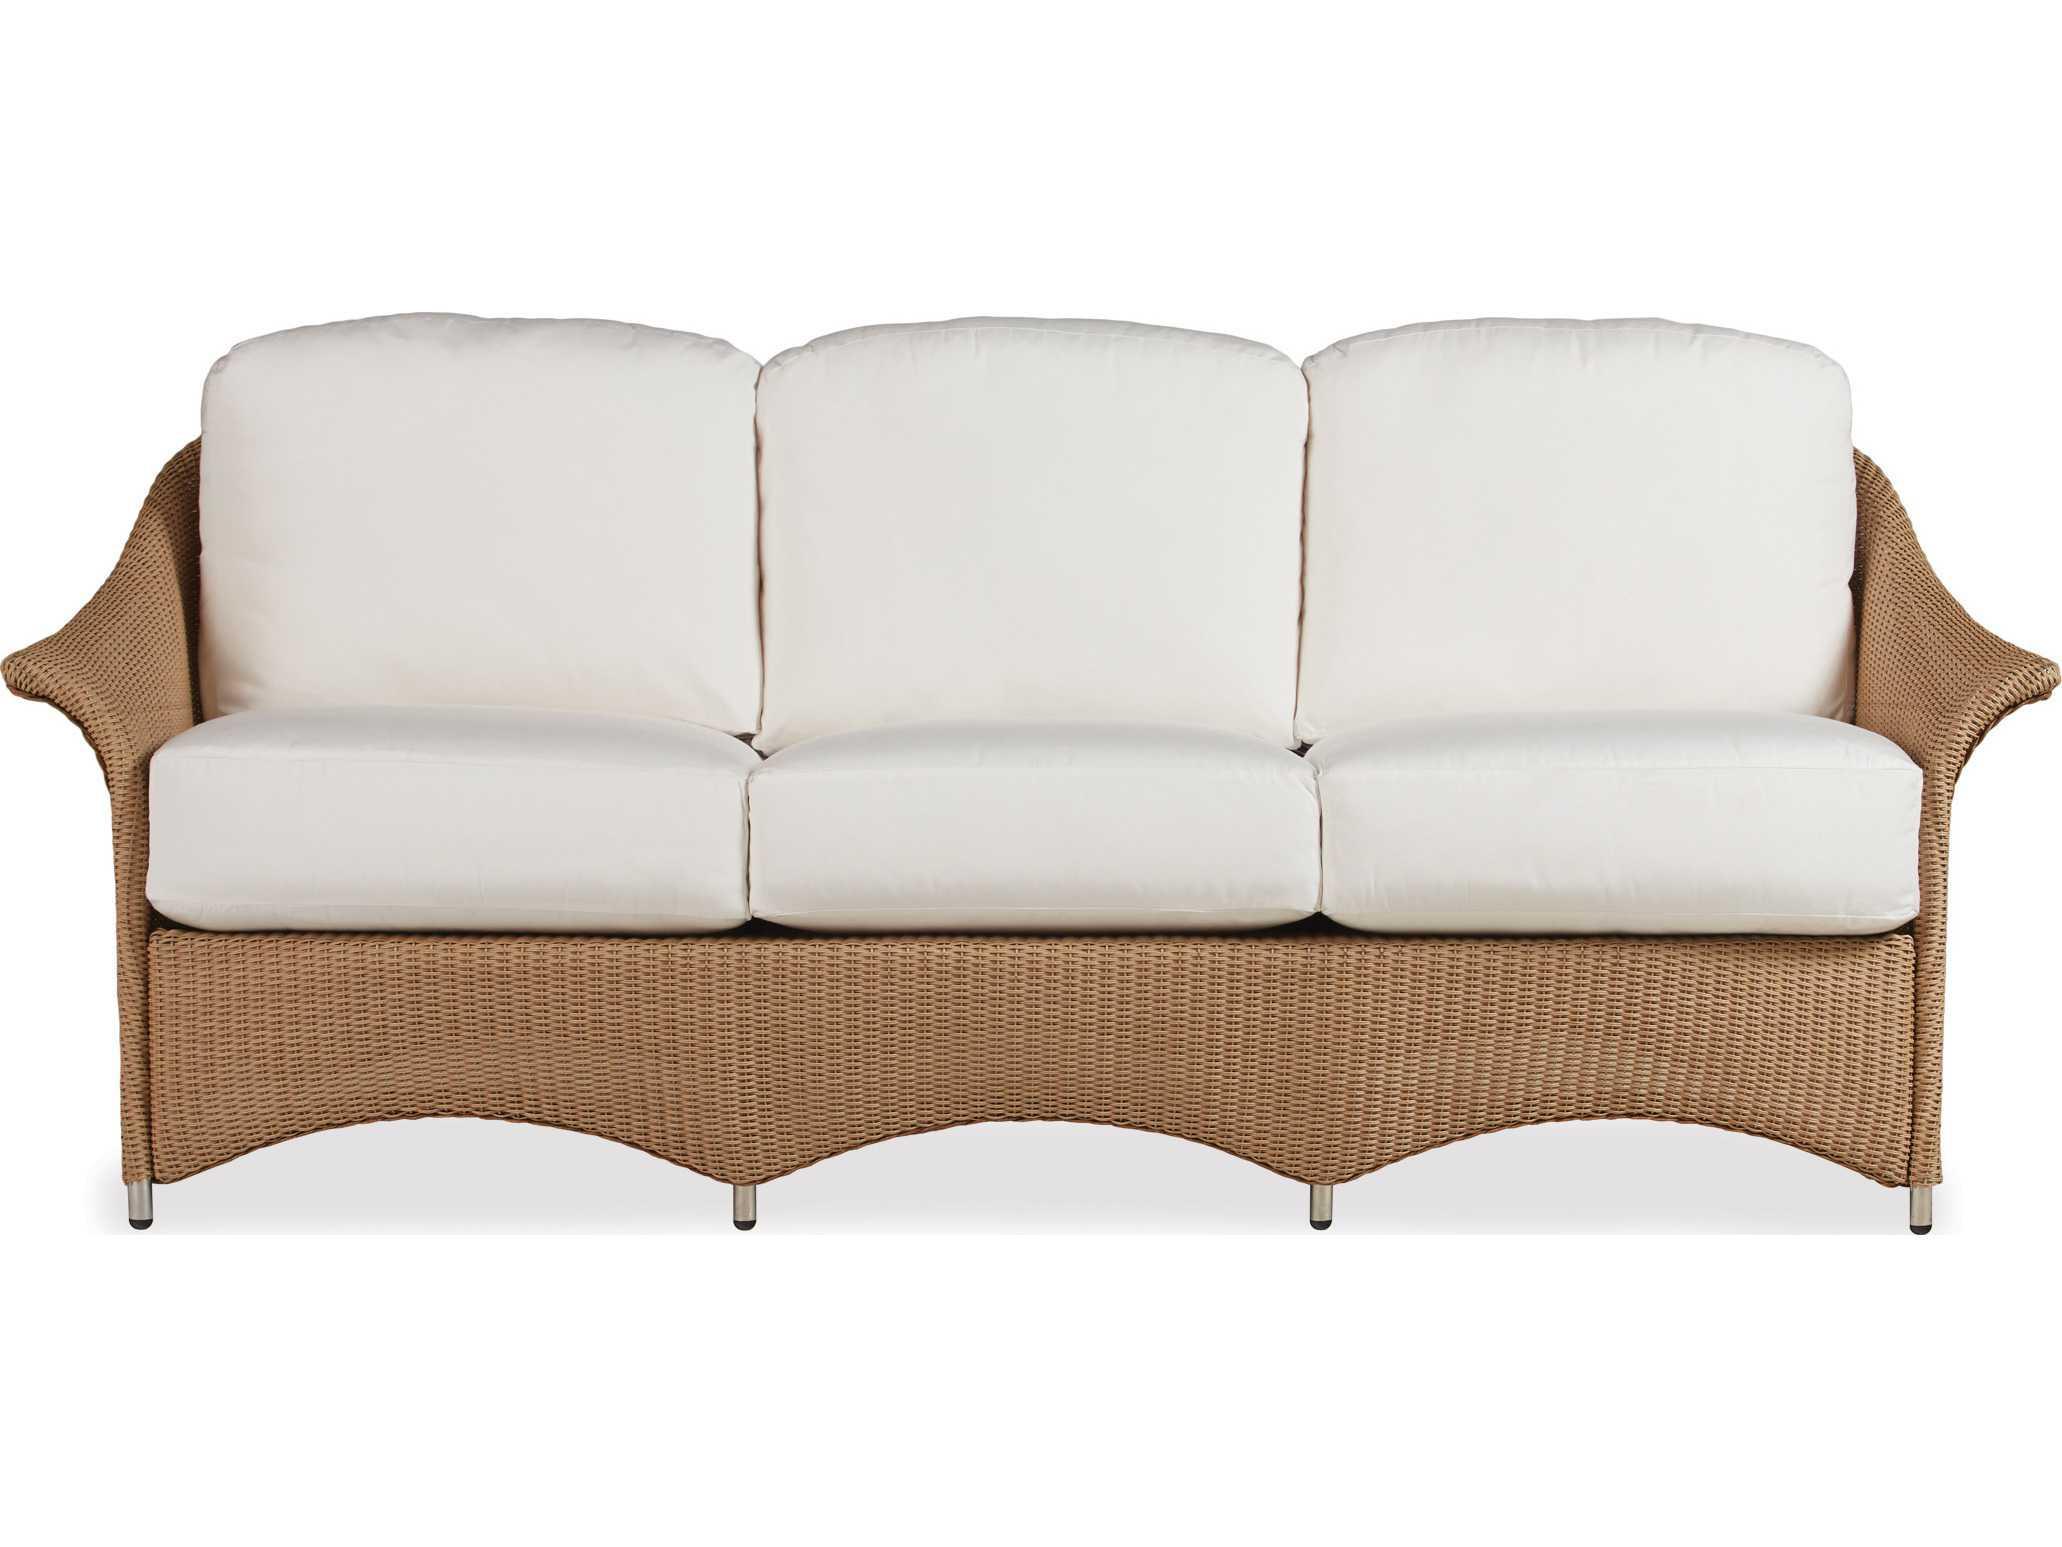 replacement cushions for sofa backs cama bed 2006 lloyd flanders generations back cushion